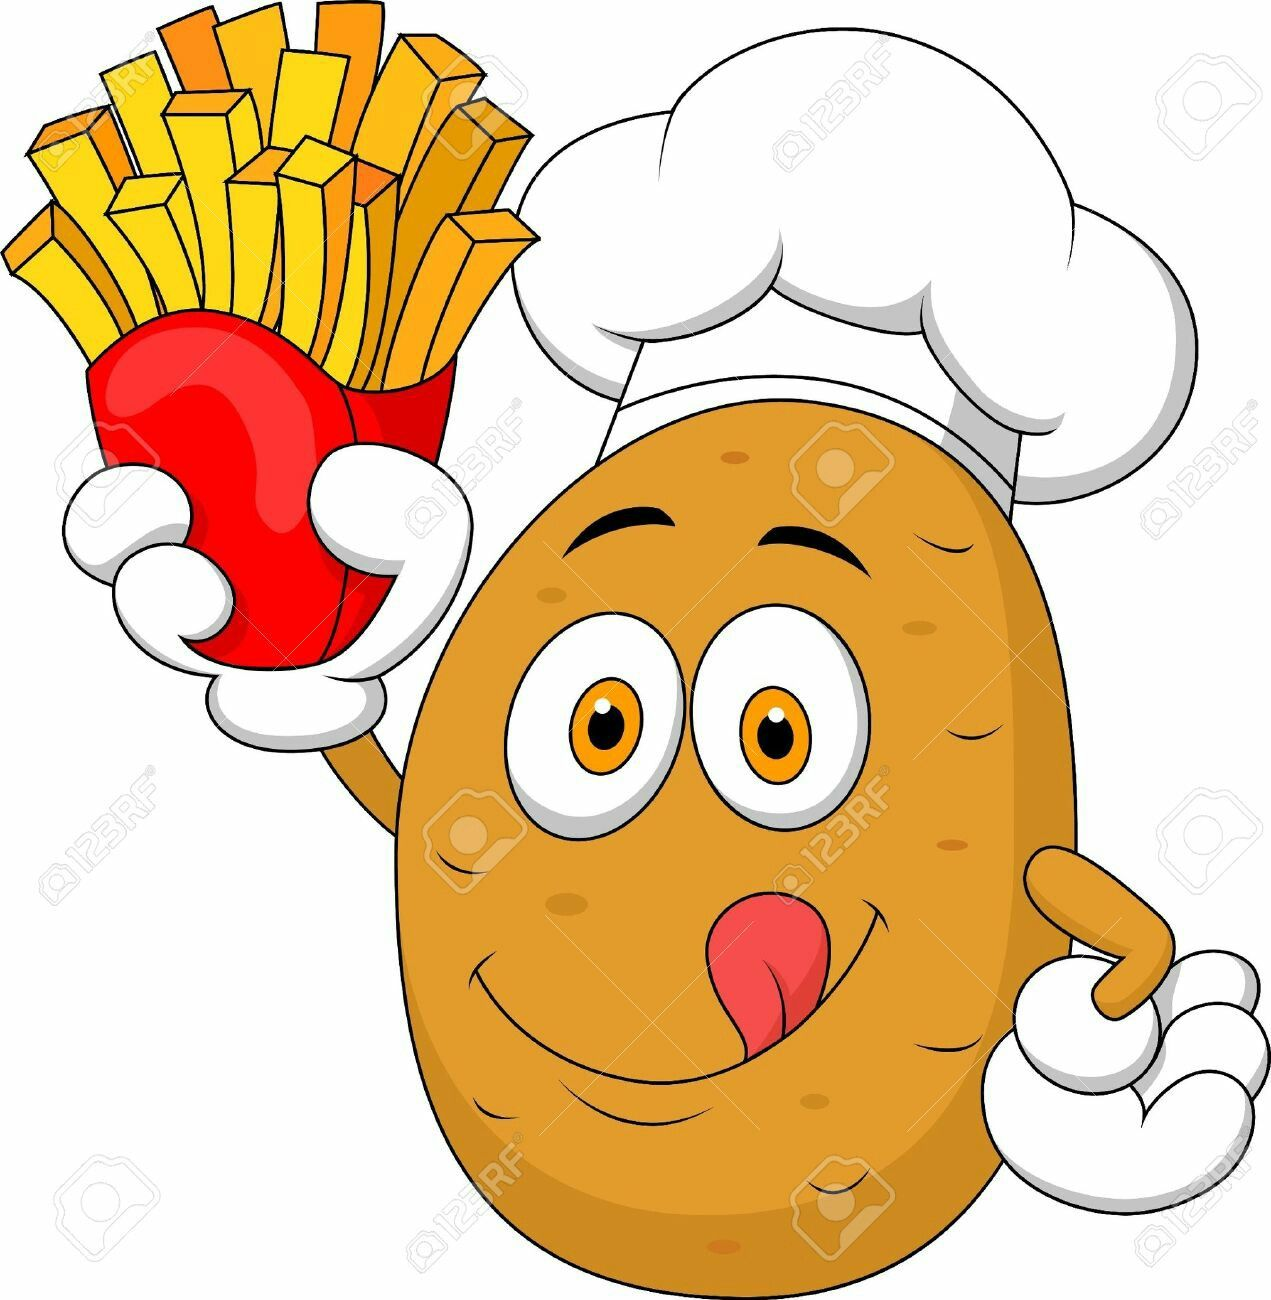 Pin By Margarita Aduviri Rojas On It S All About Emojis Emojis Everywhere French Fries Cartoon Chef Fruit Cartoon